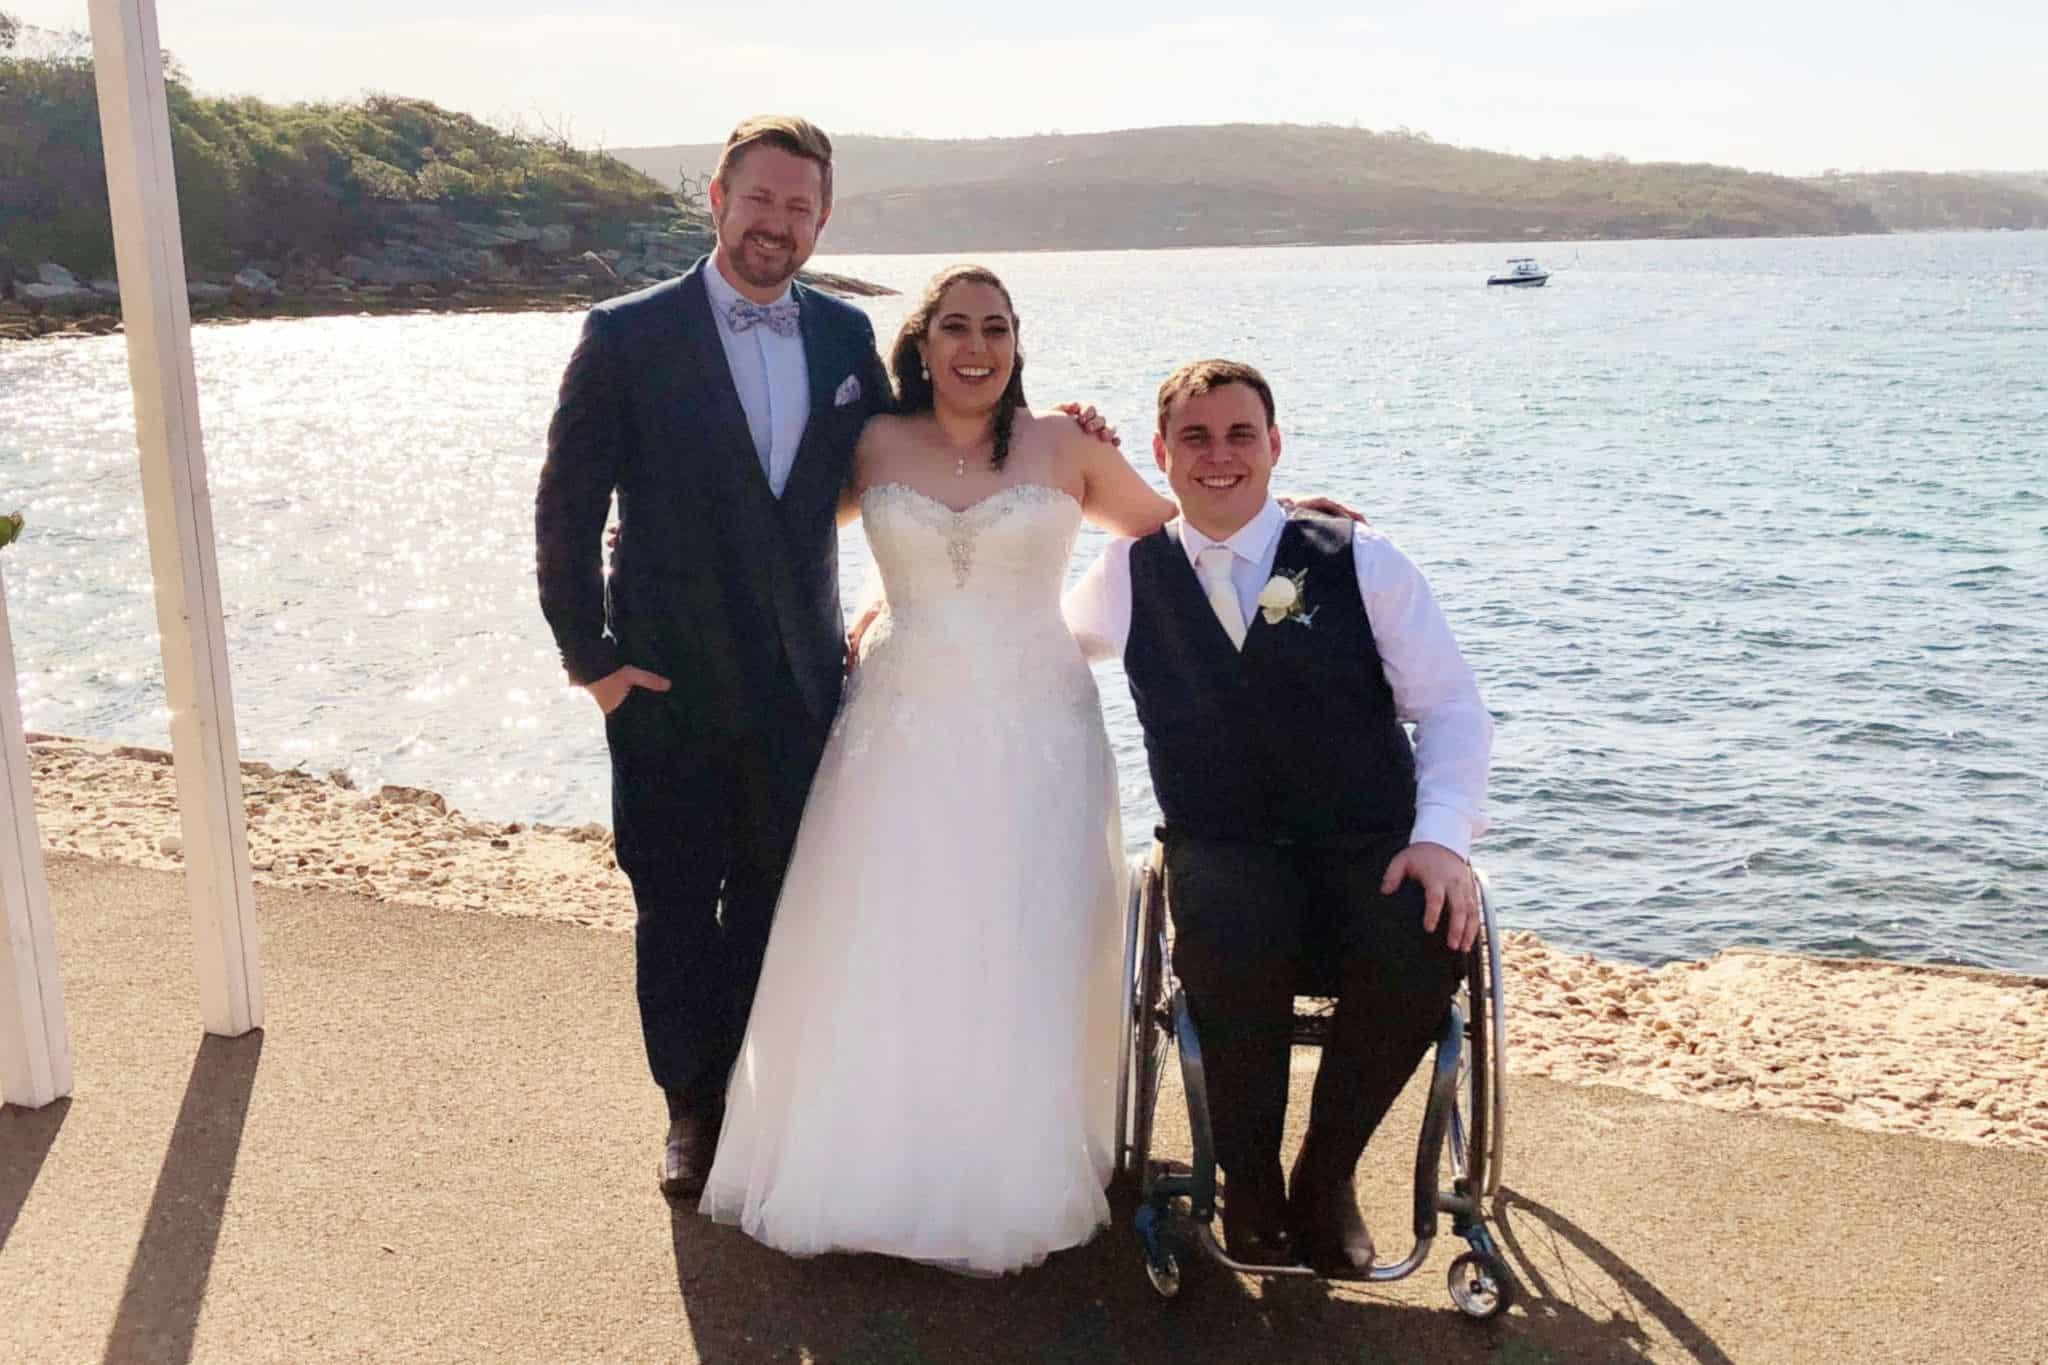 Bec and Max - Marriage Celebrant Sydney Stephen Lee